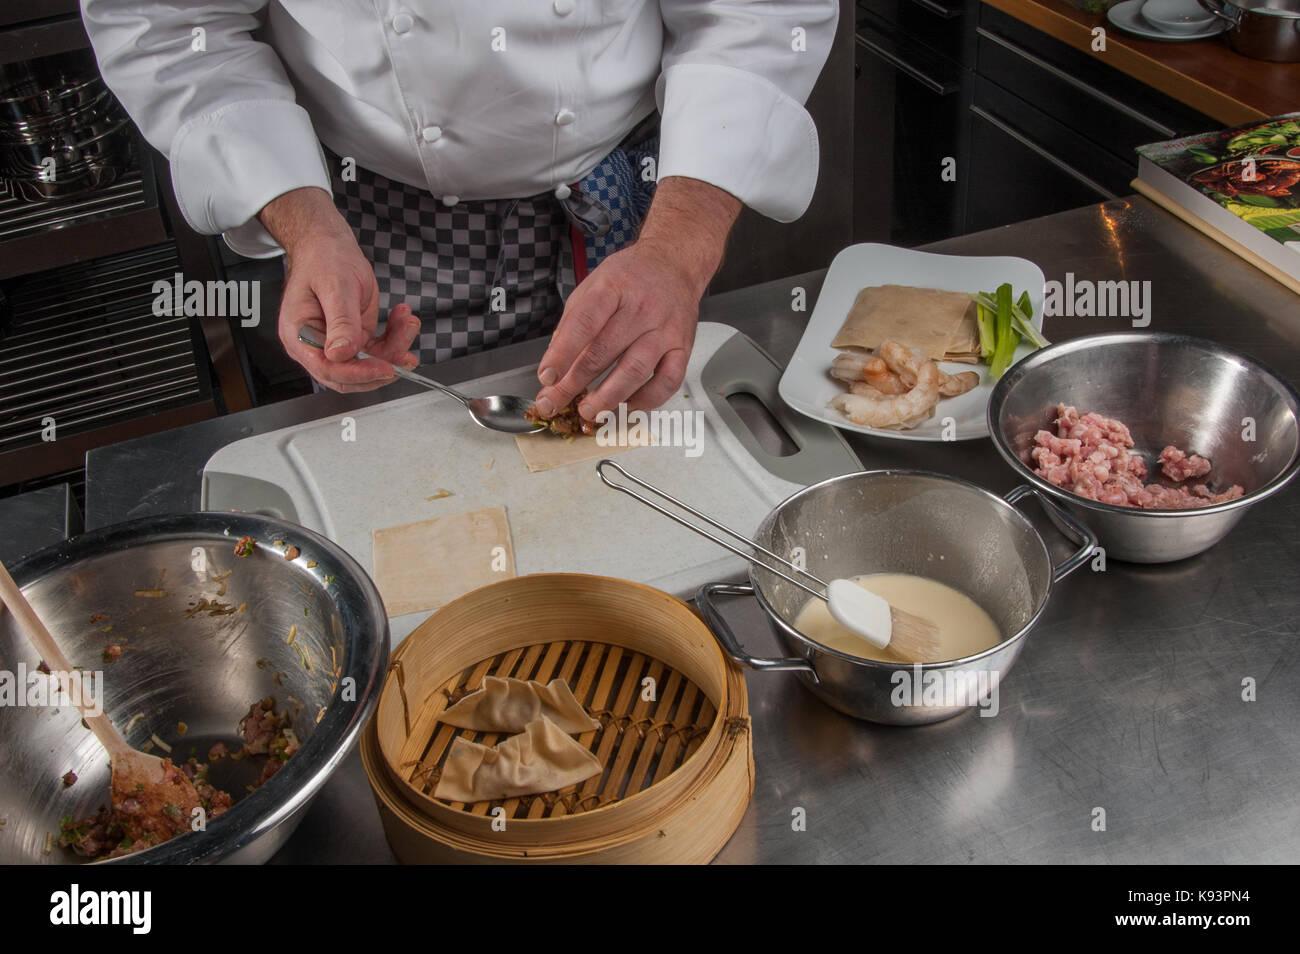 preparation of Dim Sum, Restaurant Allegria, Chef Alexander Tschebull, Hamburg, Germany - Stock Image